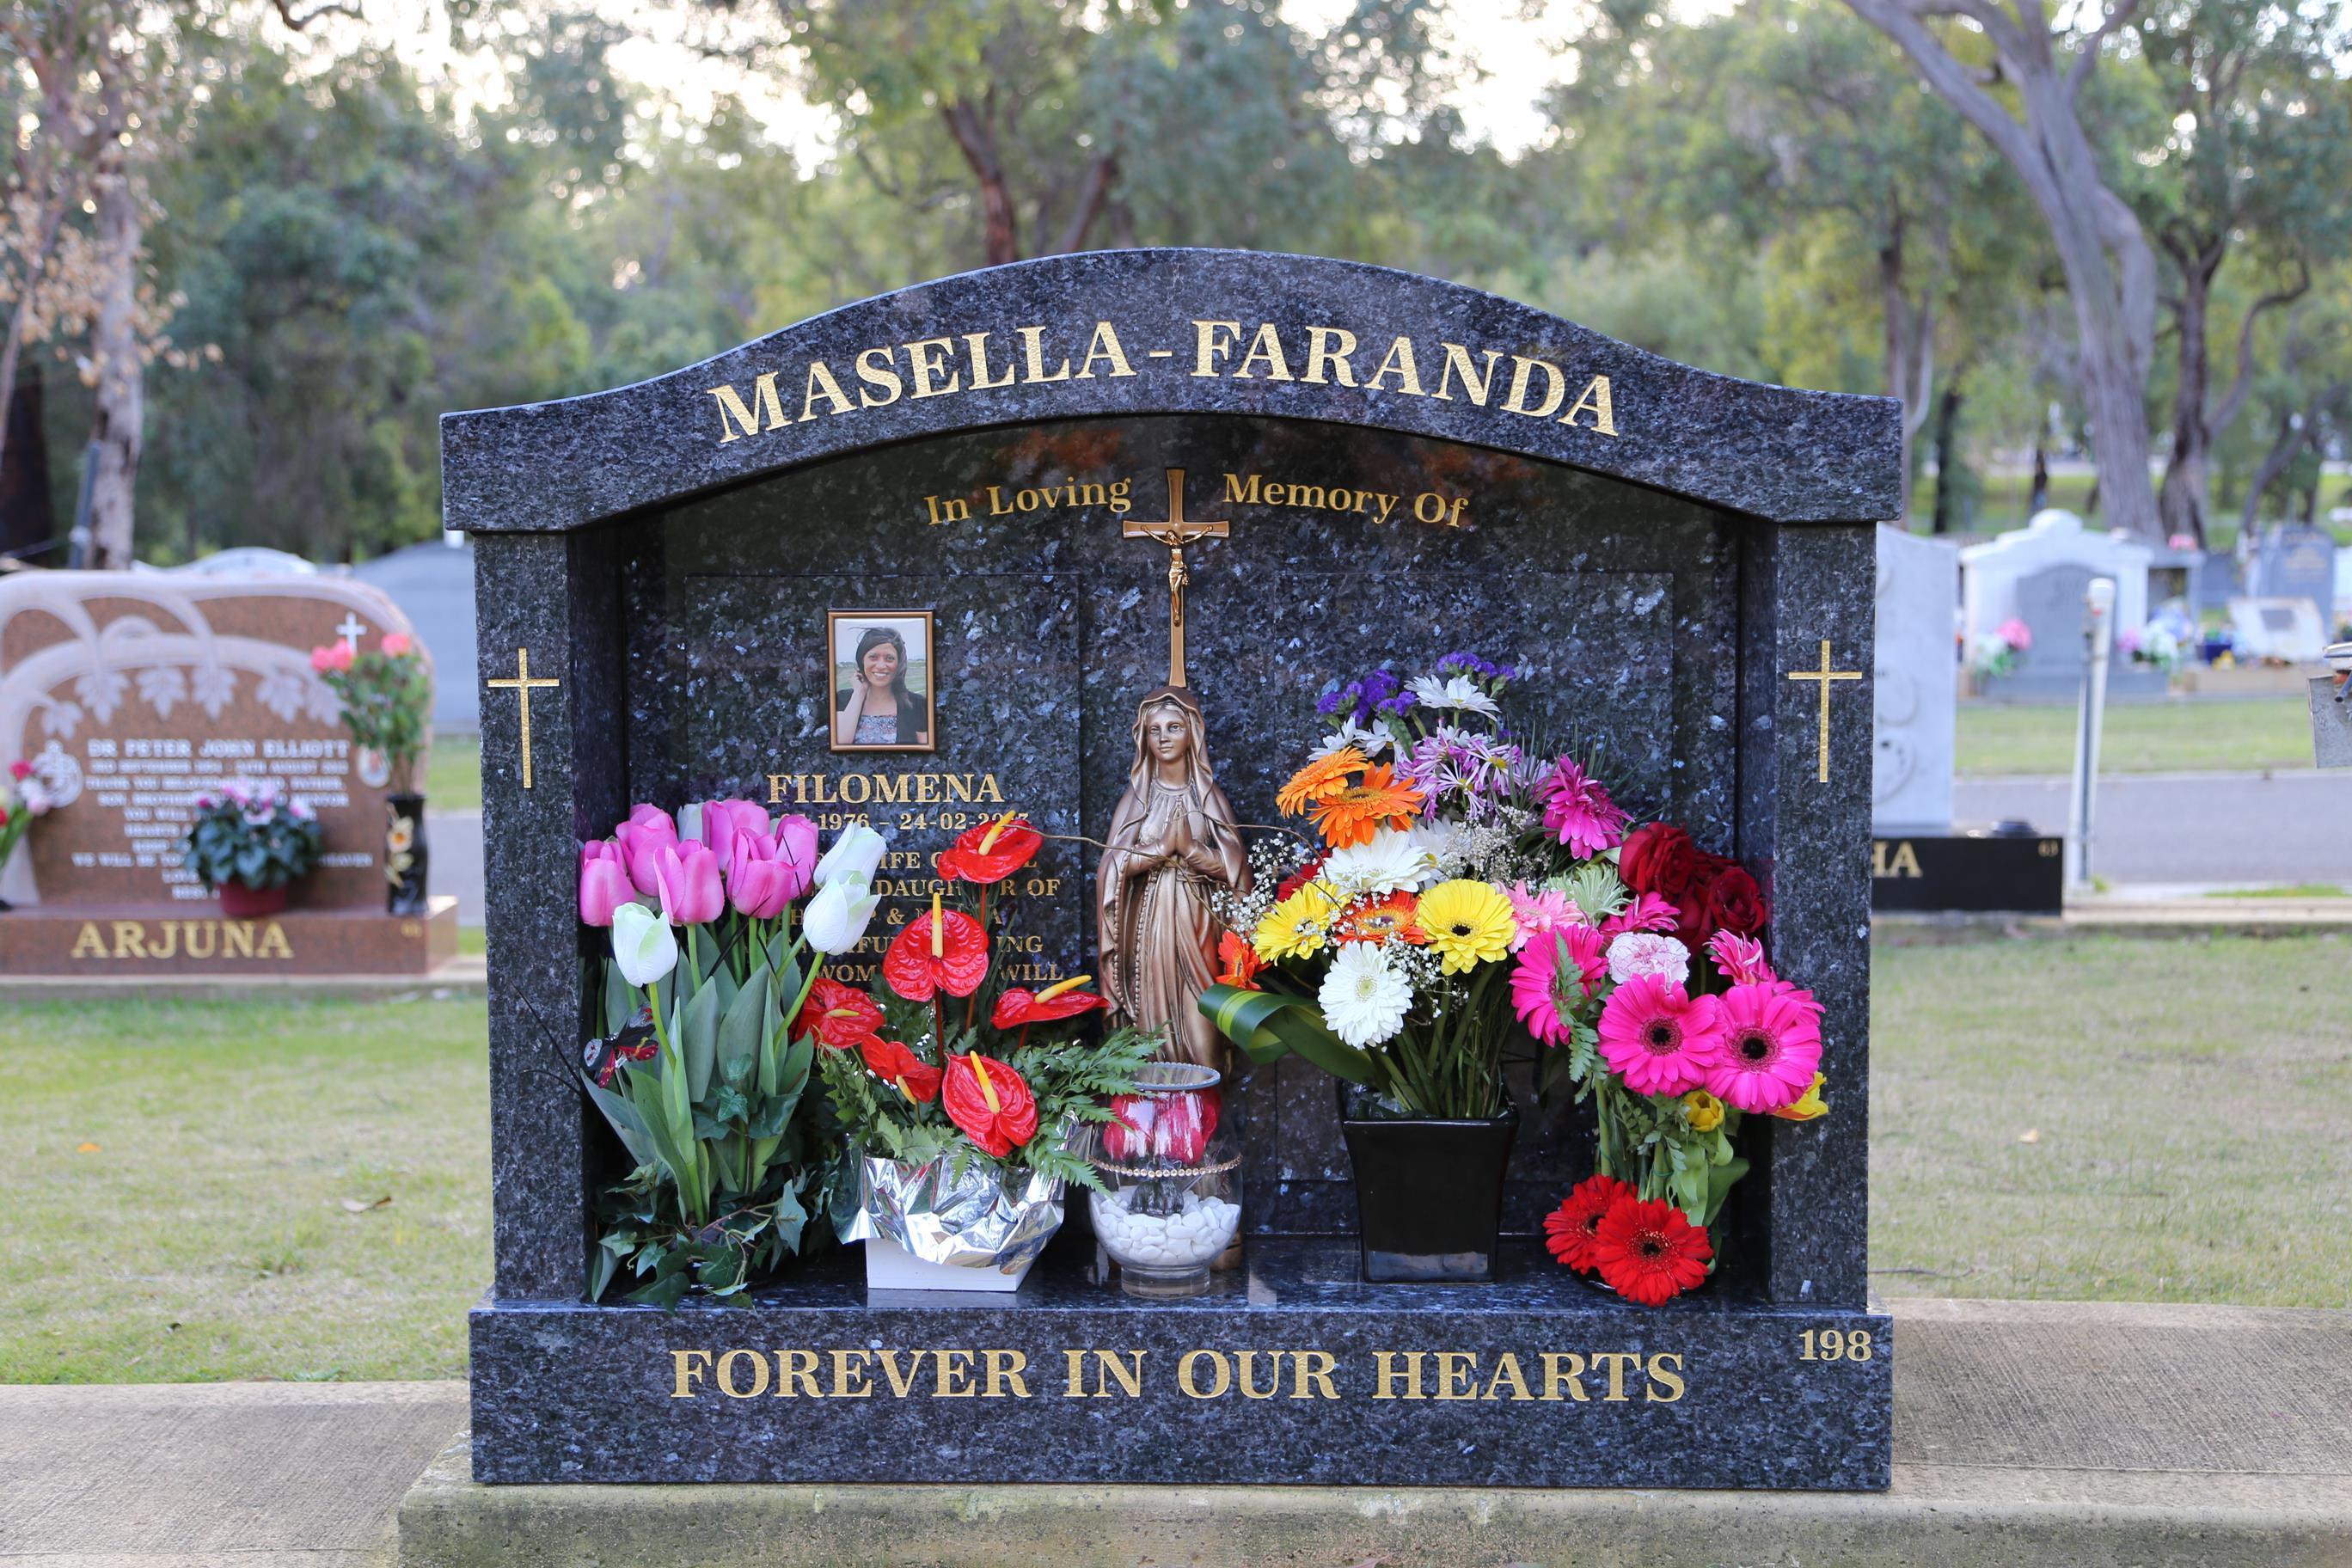 Masella-Faranda 2013